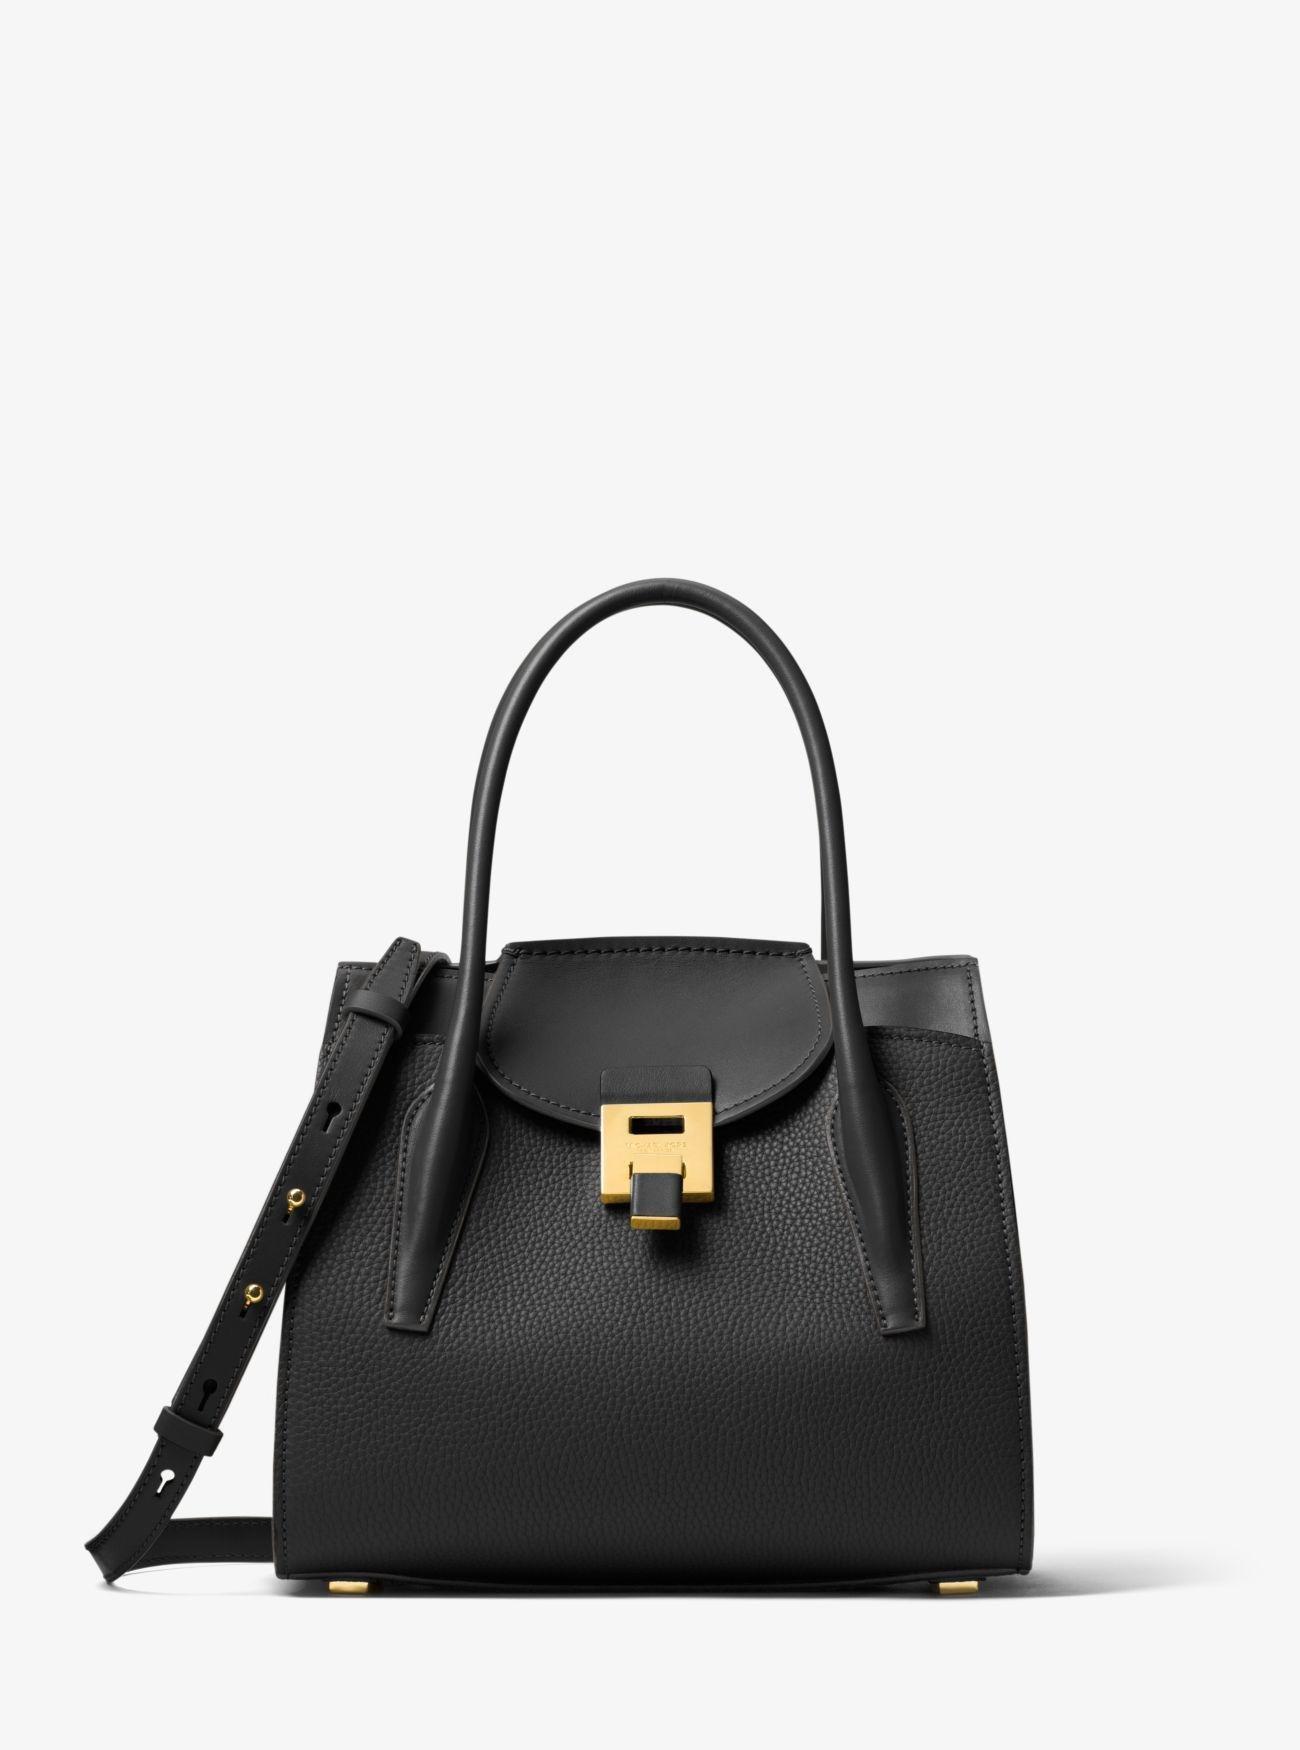 2c5a16b1cdf1 Michael Kors Bancroft Medium Pebbled Calf Leather Satchel in Black ...